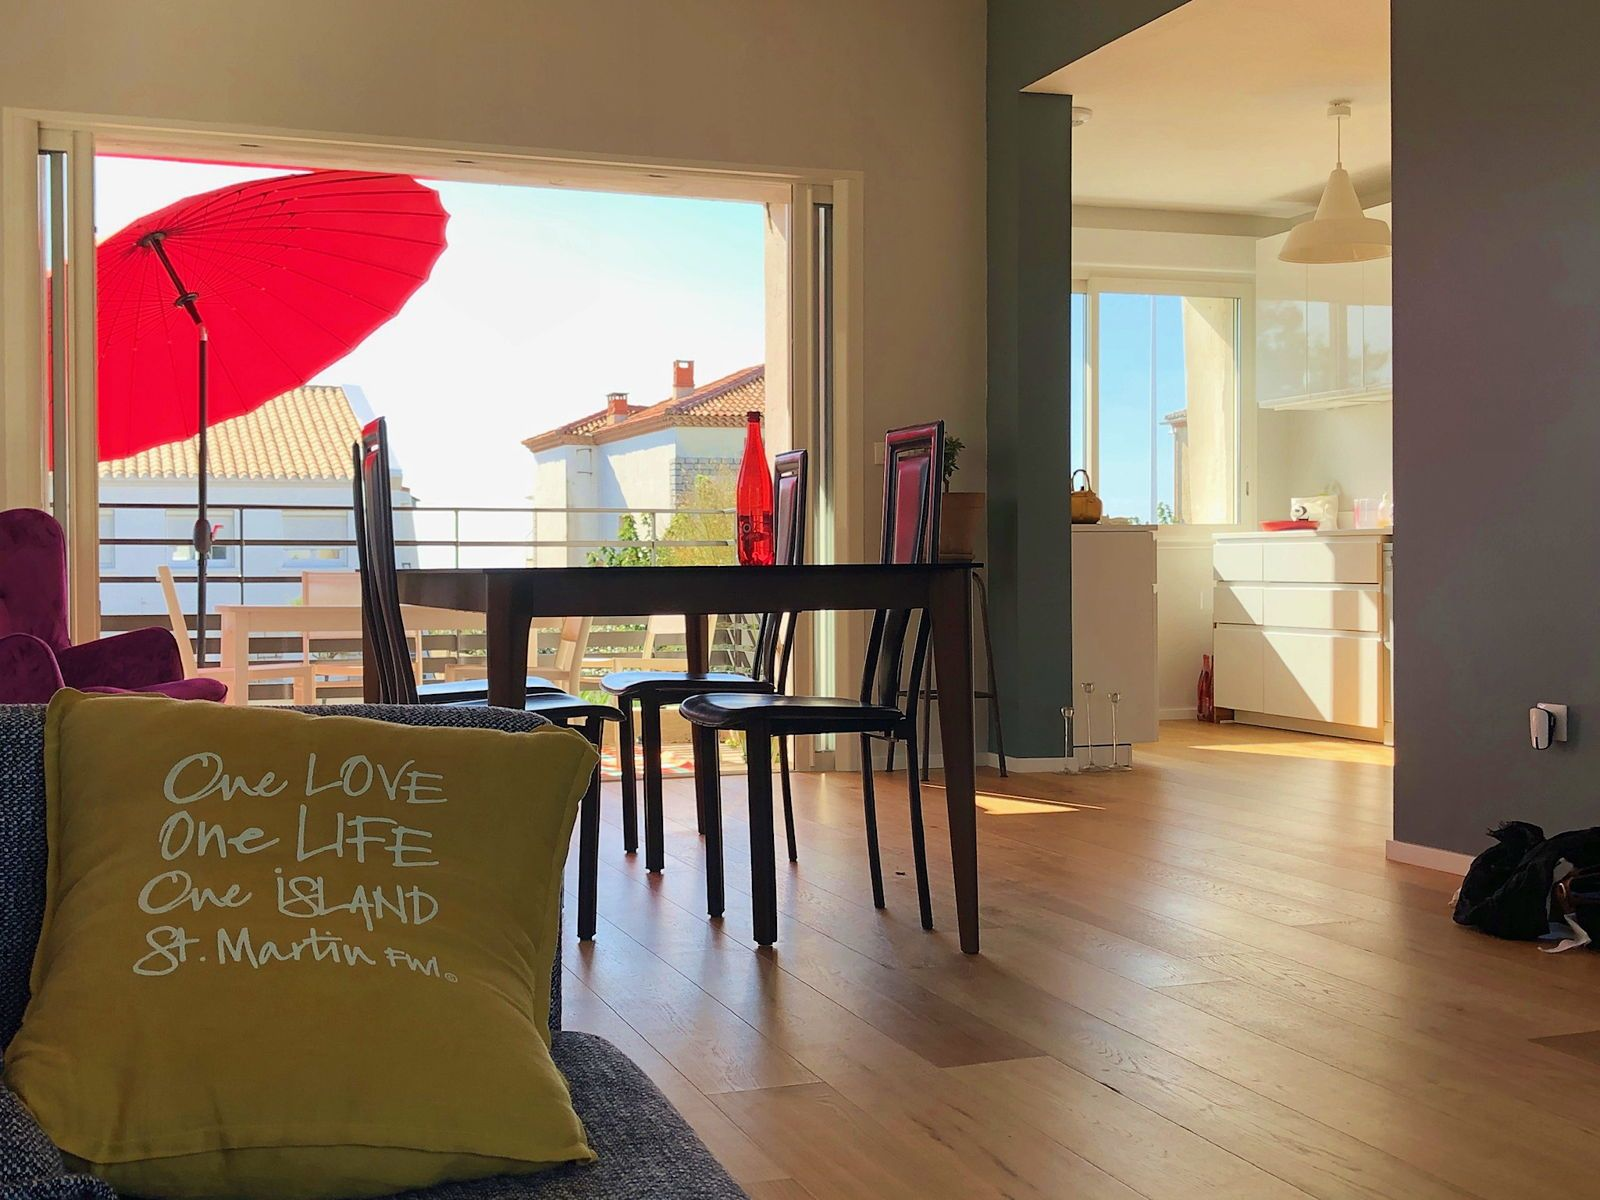 Loue villa bord de mer, Carnon plage - 2chambres 4couchages